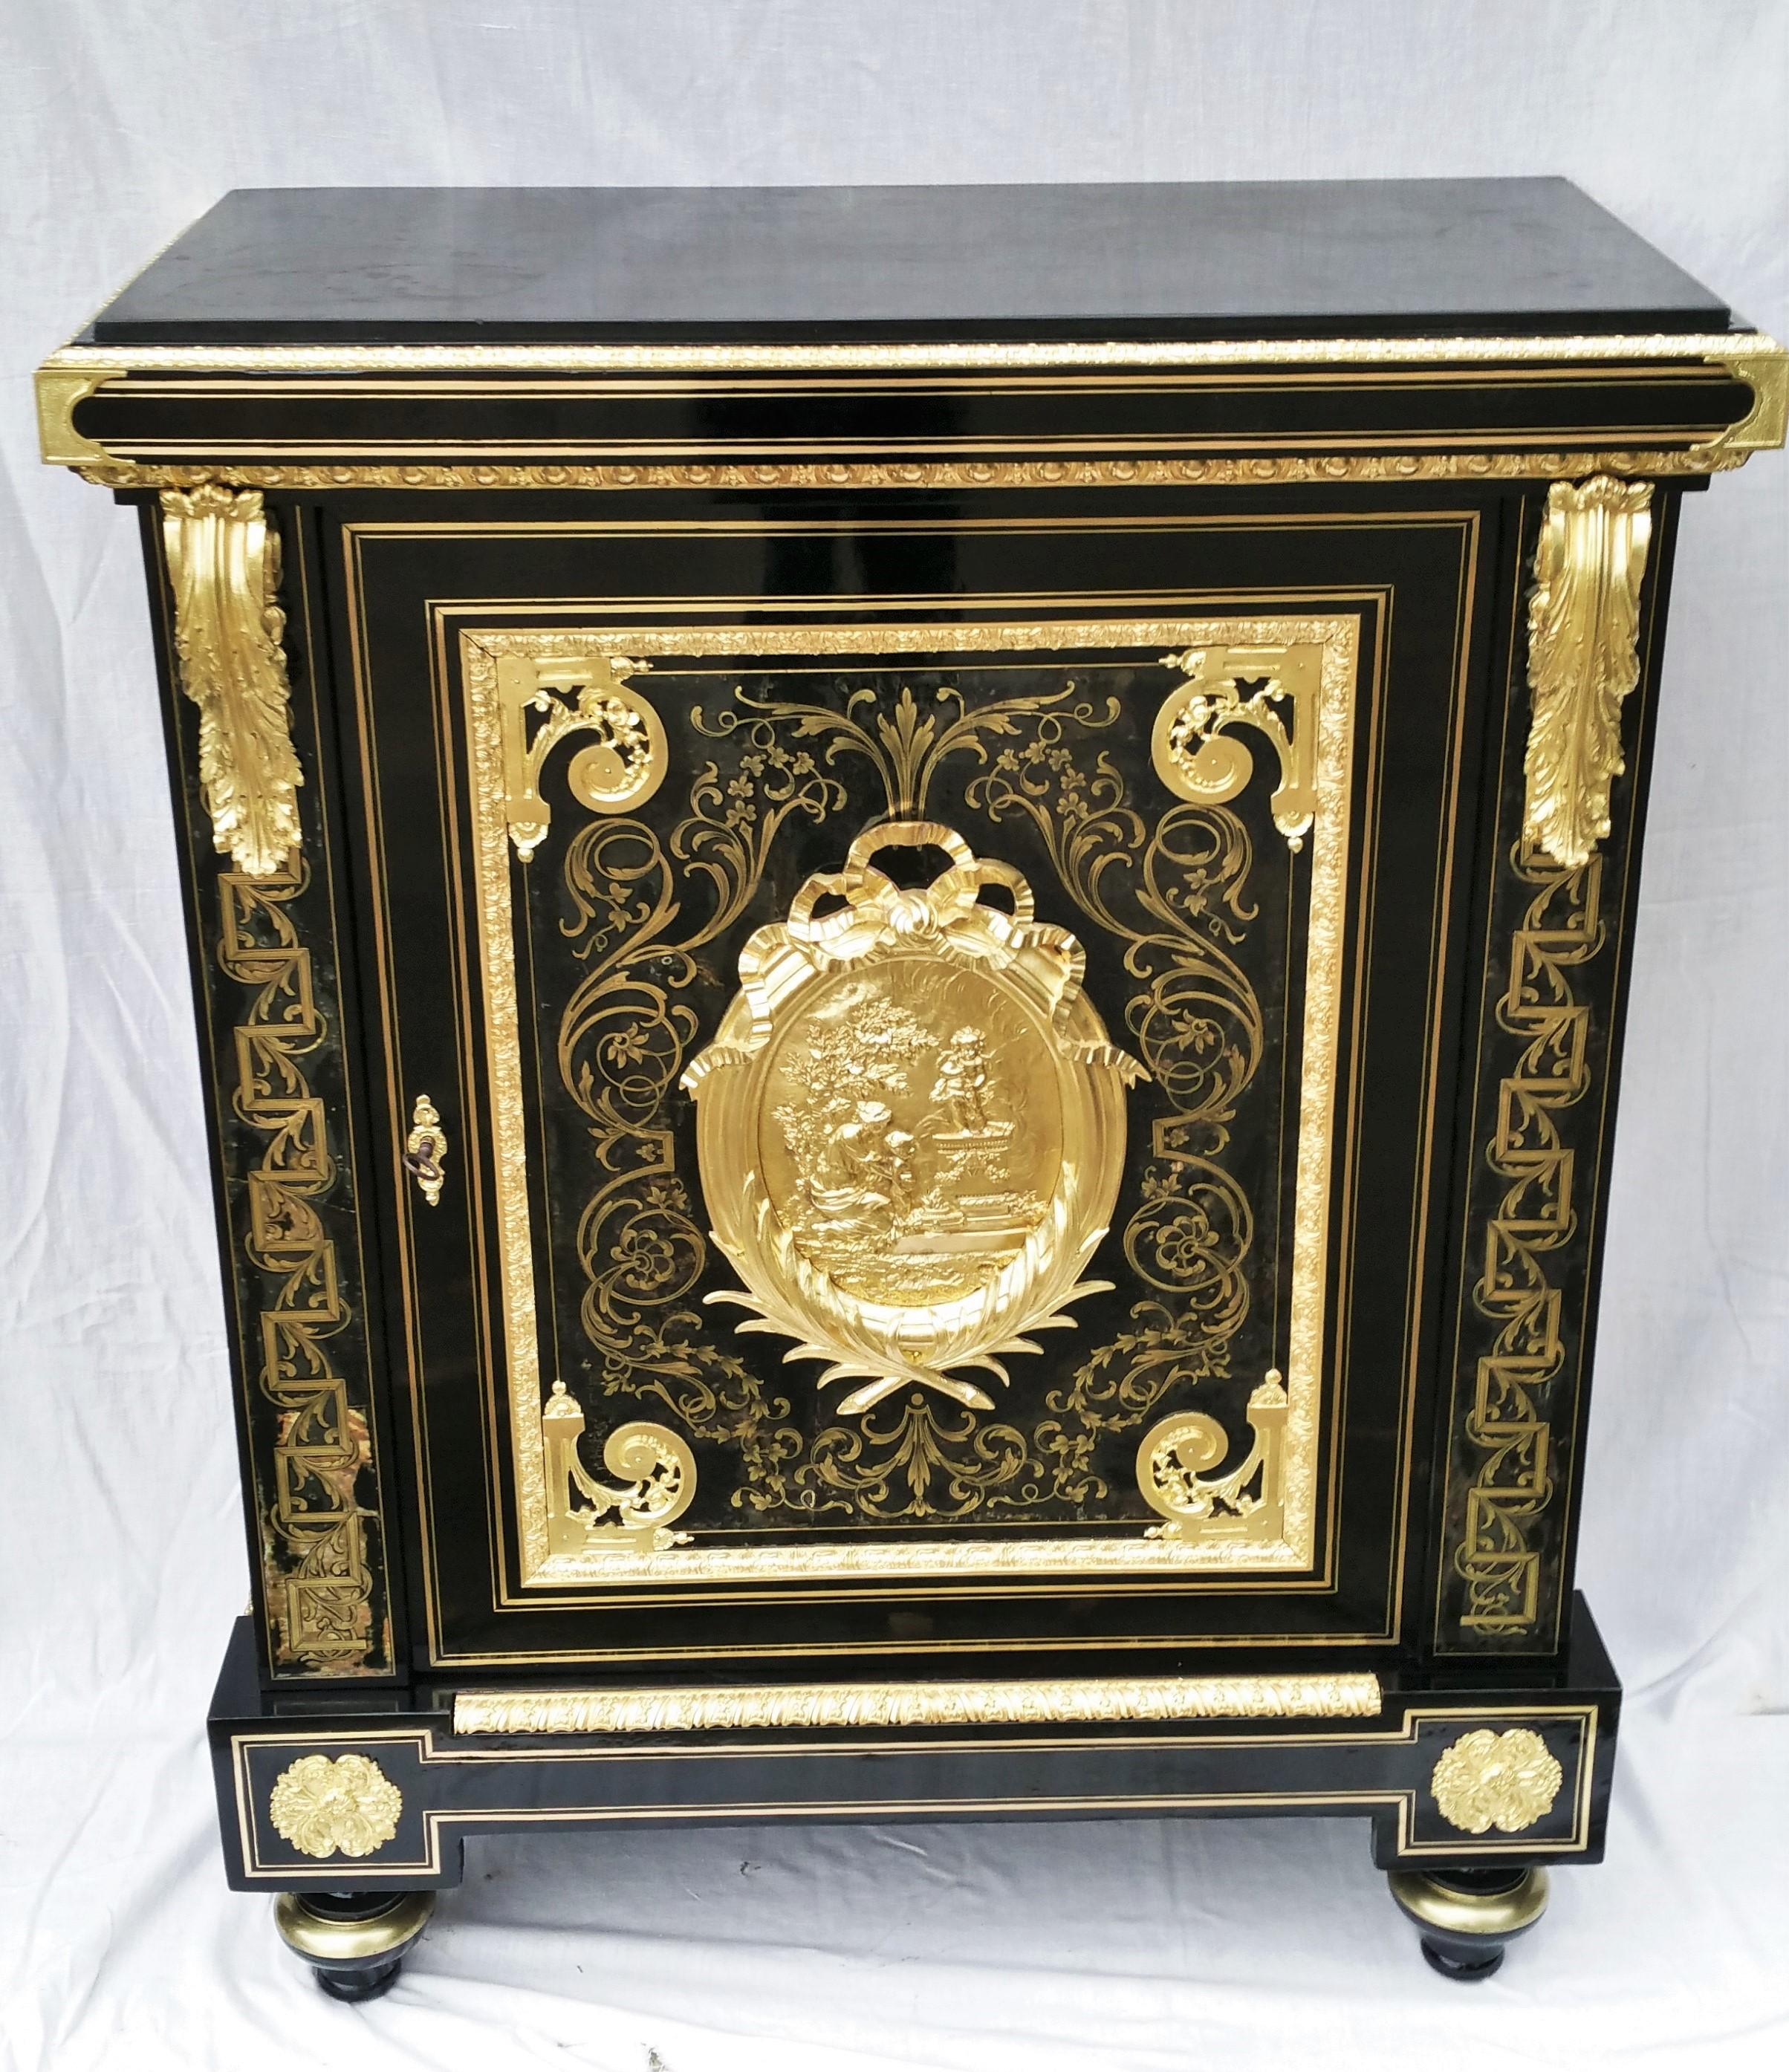 Meuble d'apparat marqueterie Boulle signé BEFORT jeune Napoleon III